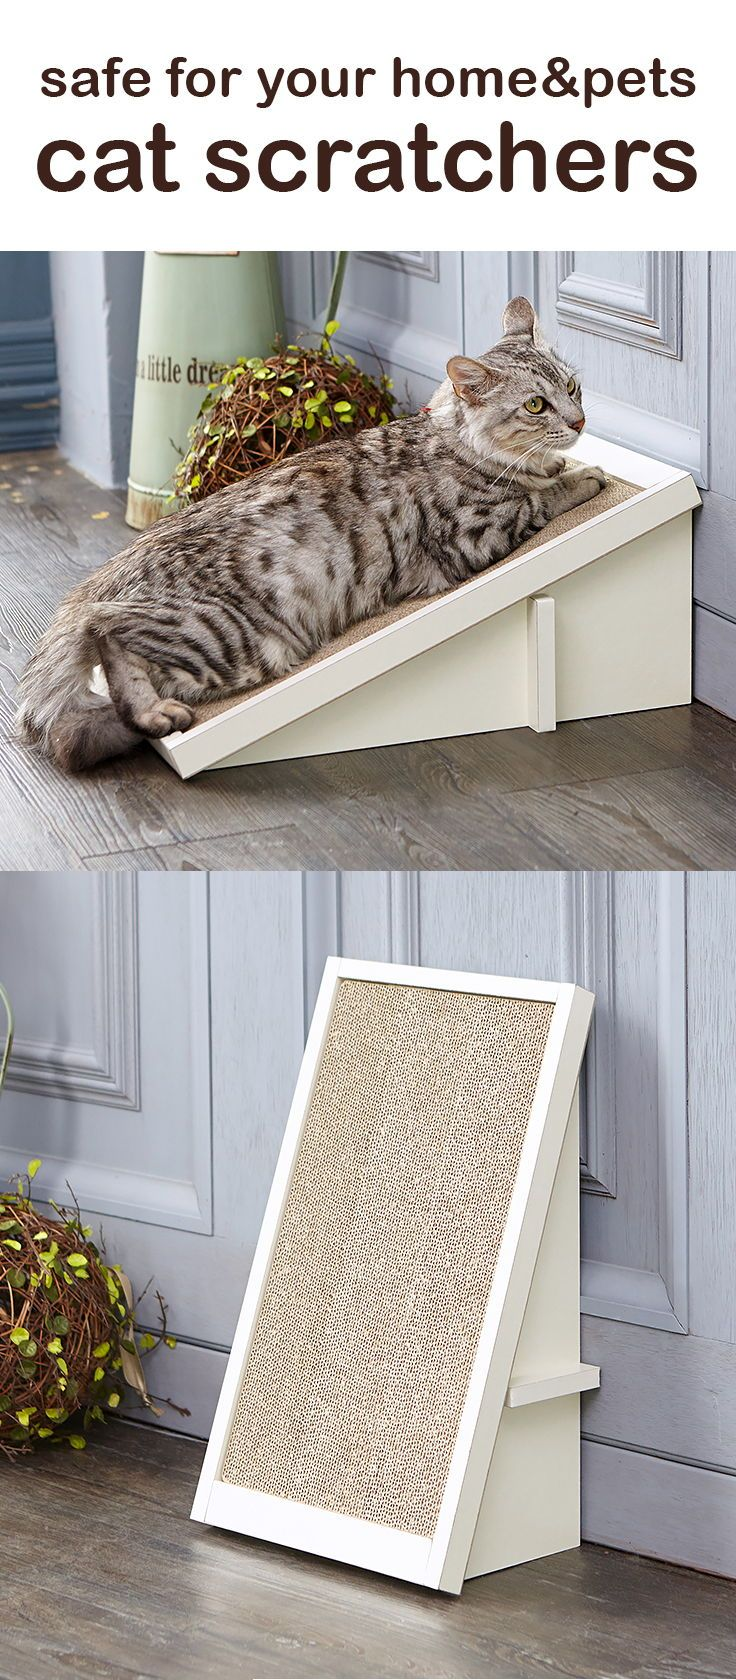 Save Your Furniture With These Beautiful Cat Scratchers Cat Scratchers Cat Training Litter Box Kitten Accessories